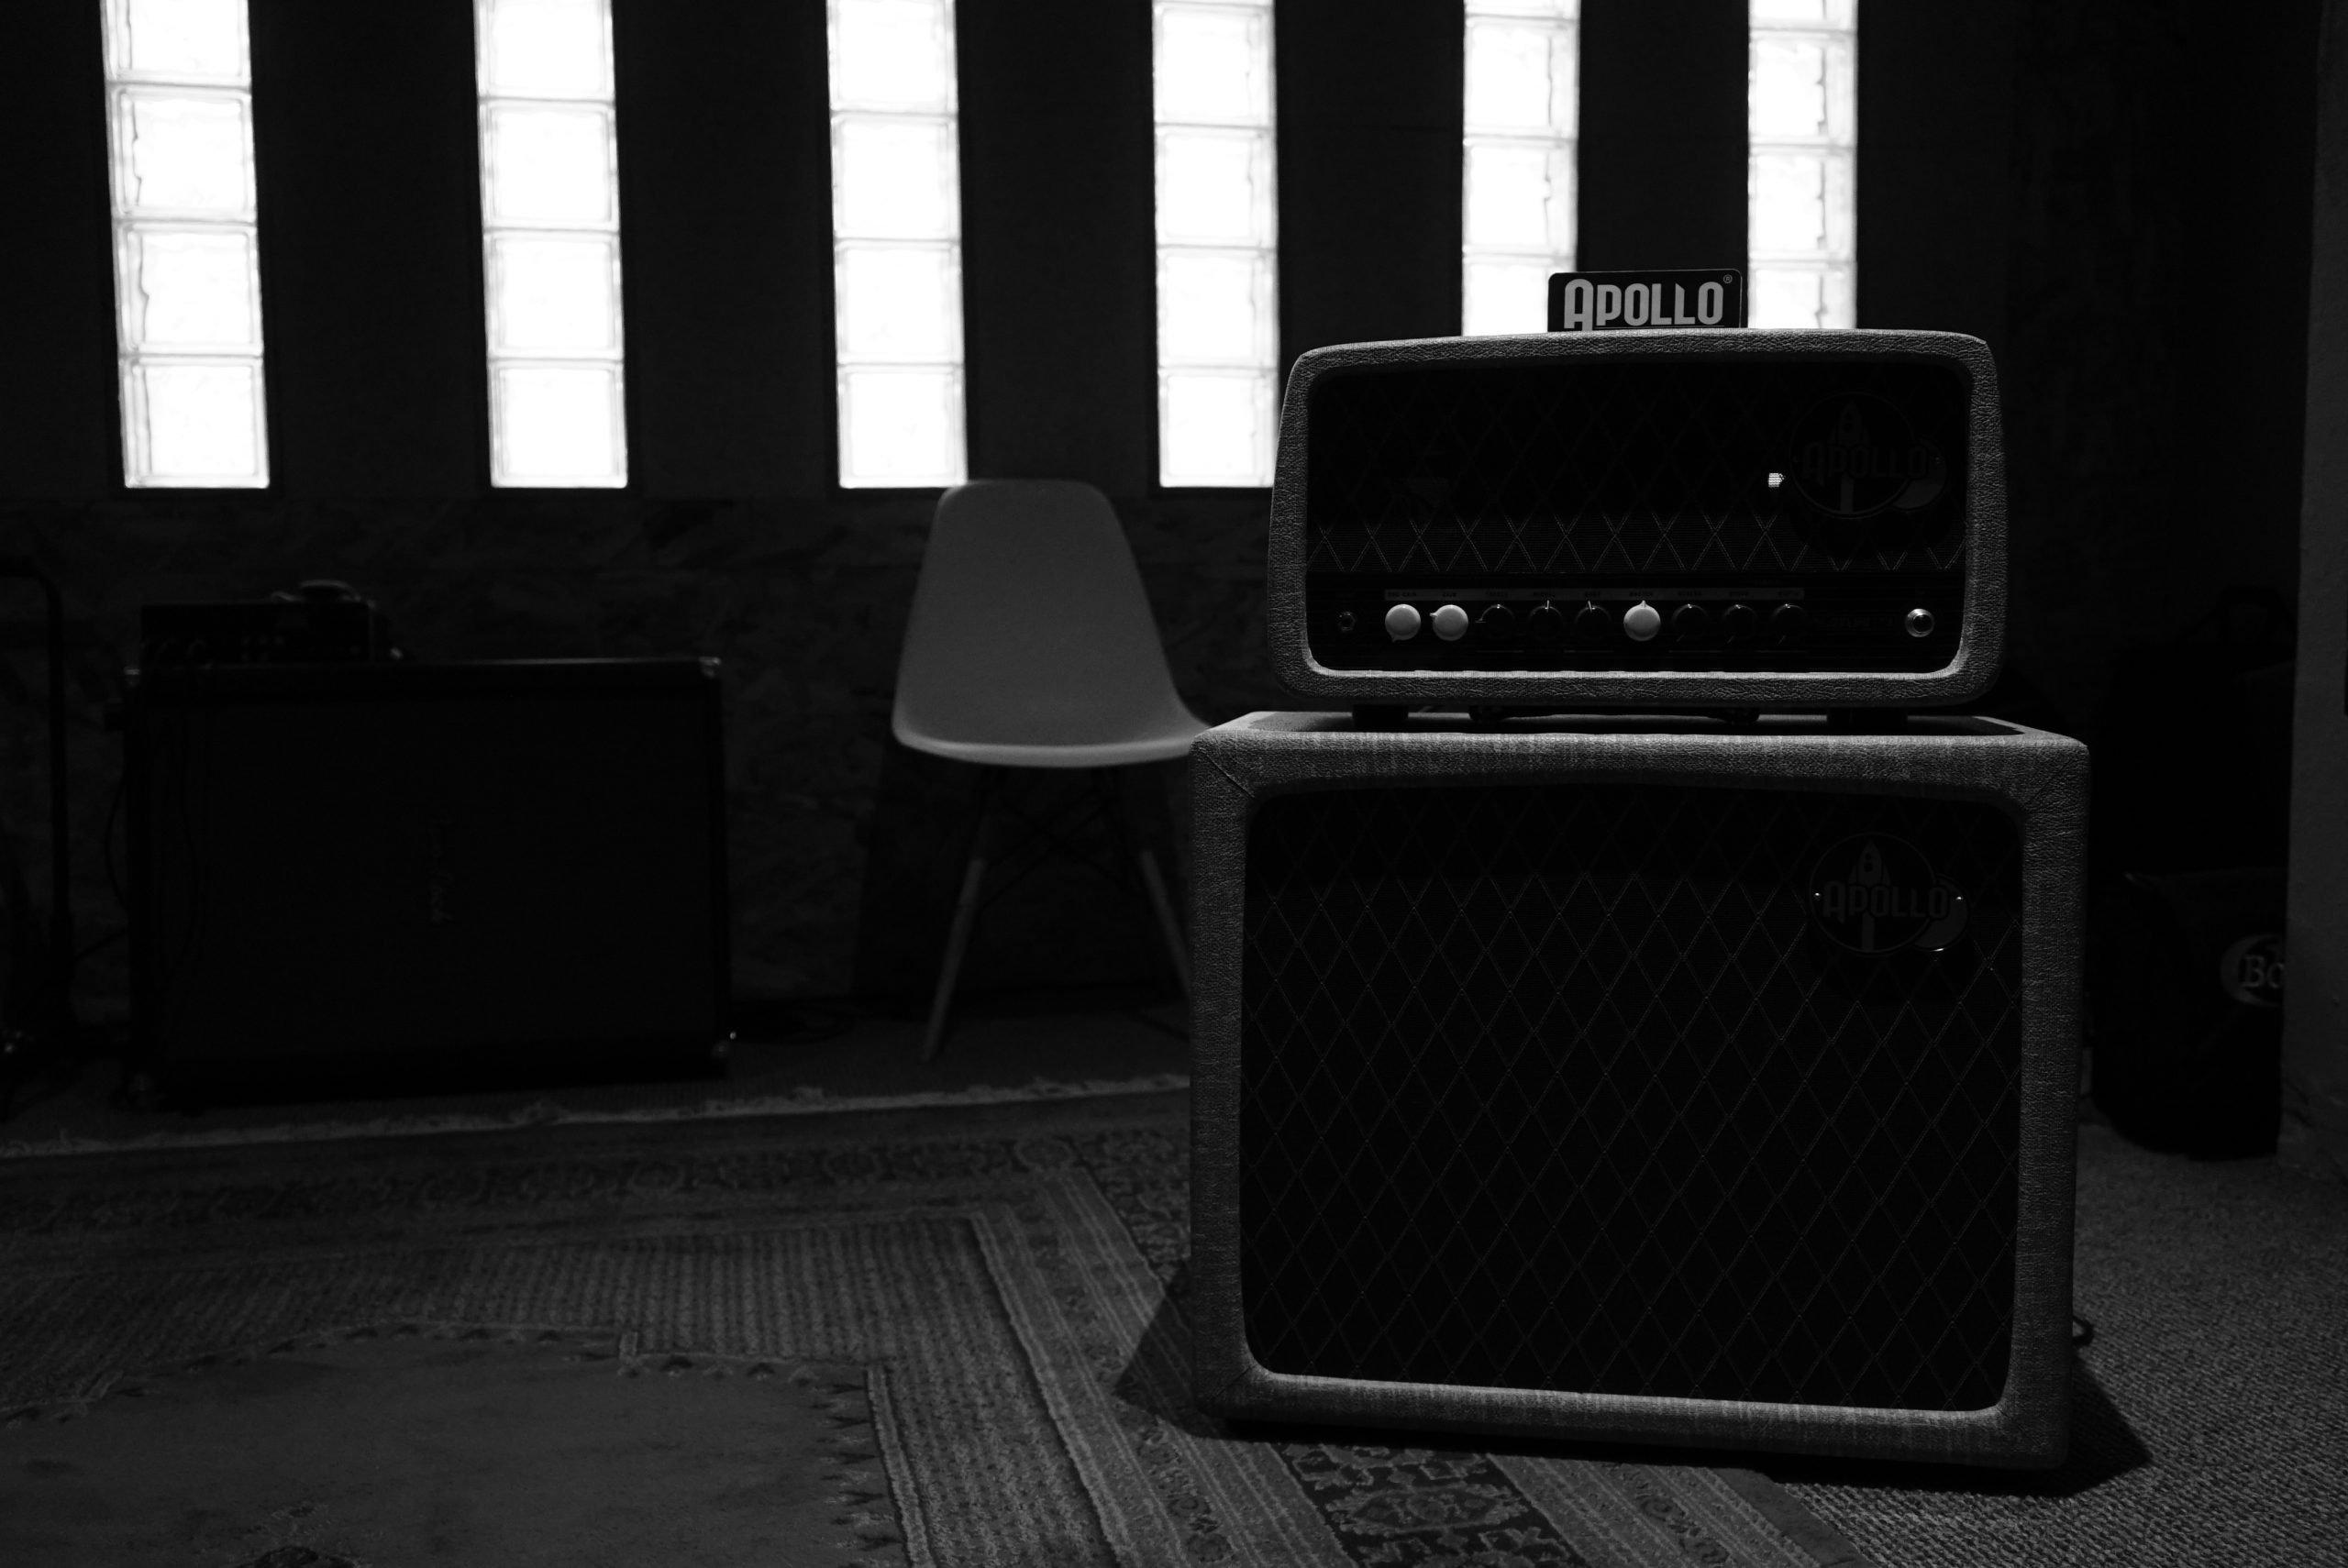 Amplificador Apollo Ummagumma Club de Ensayo